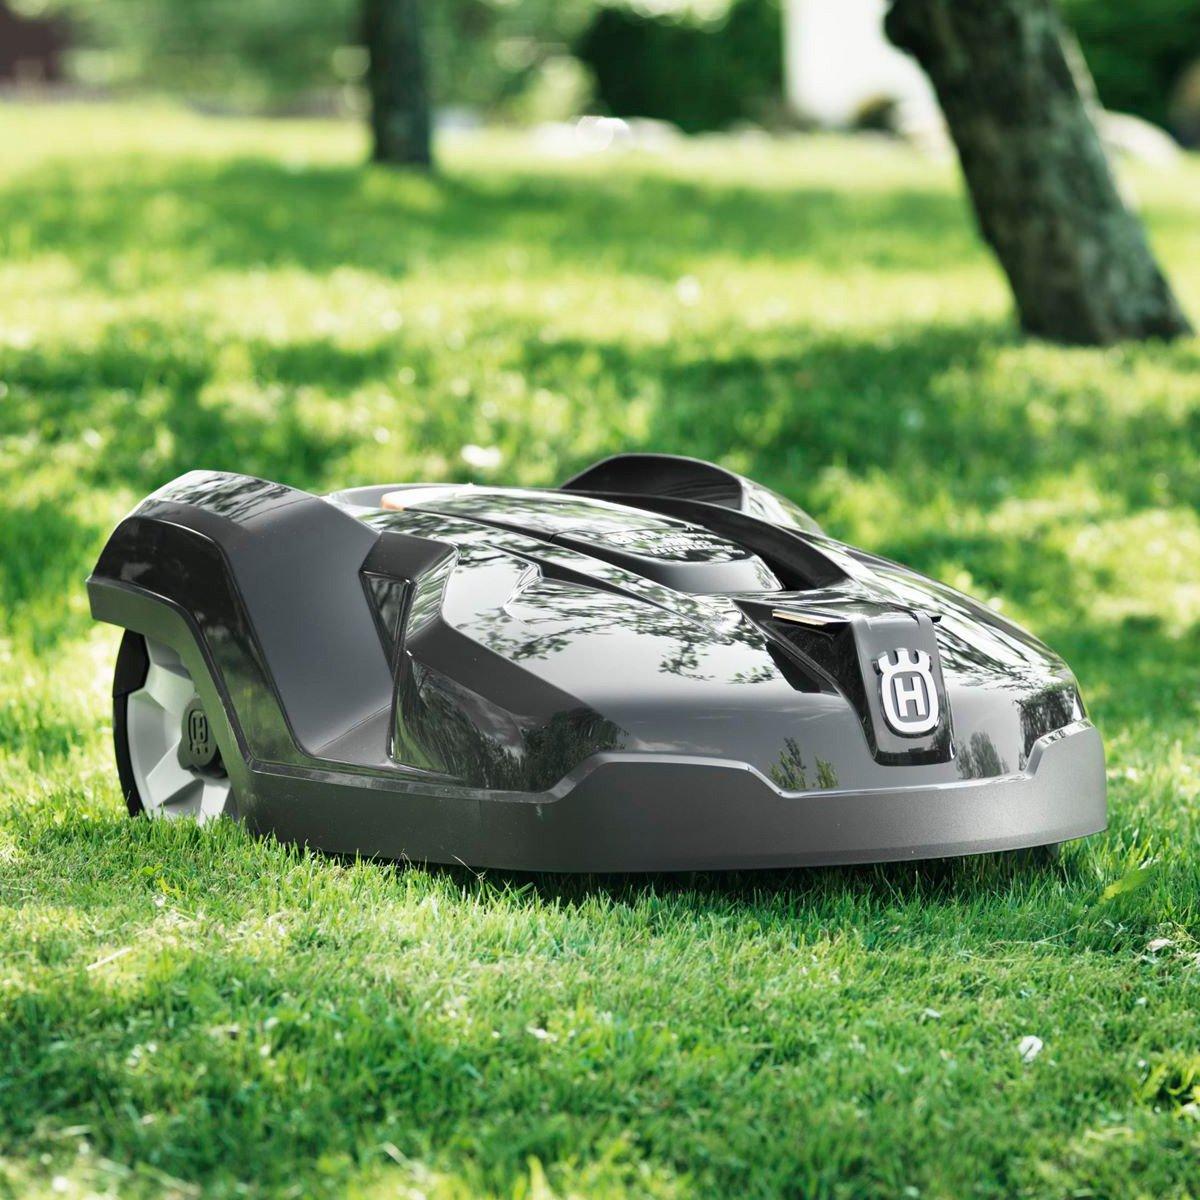 husqvarna 967623405 automower 315 robotic lawn mower autos post. Black Bedroom Furniture Sets. Home Design Ideas